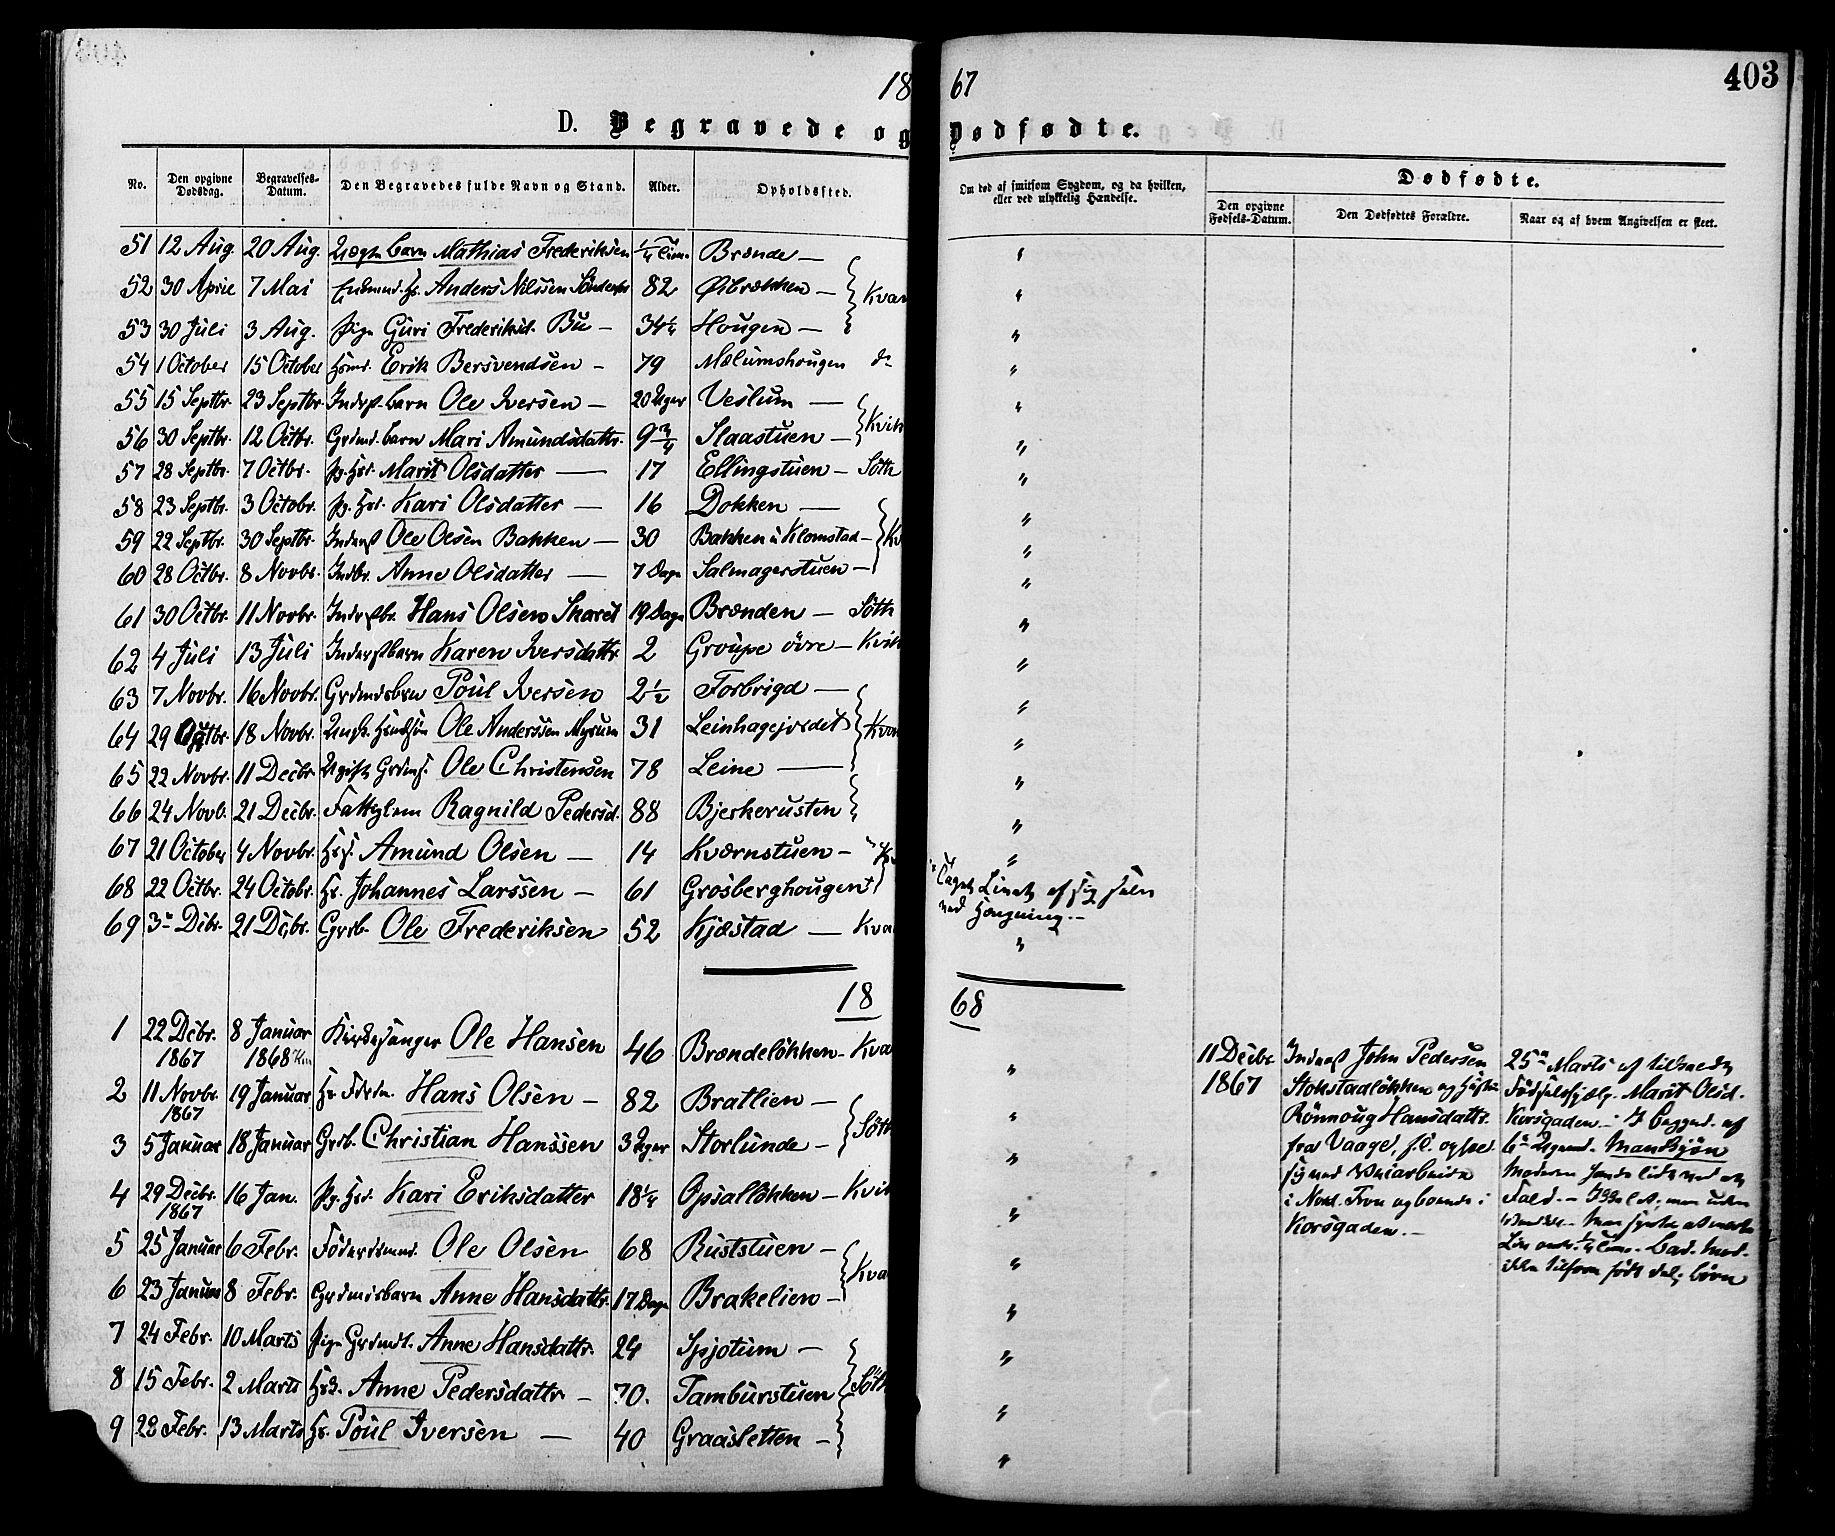 SAH, Nord-Fron prestekontor, Ministerialbok nr. 2, 1865-1883, s. 403